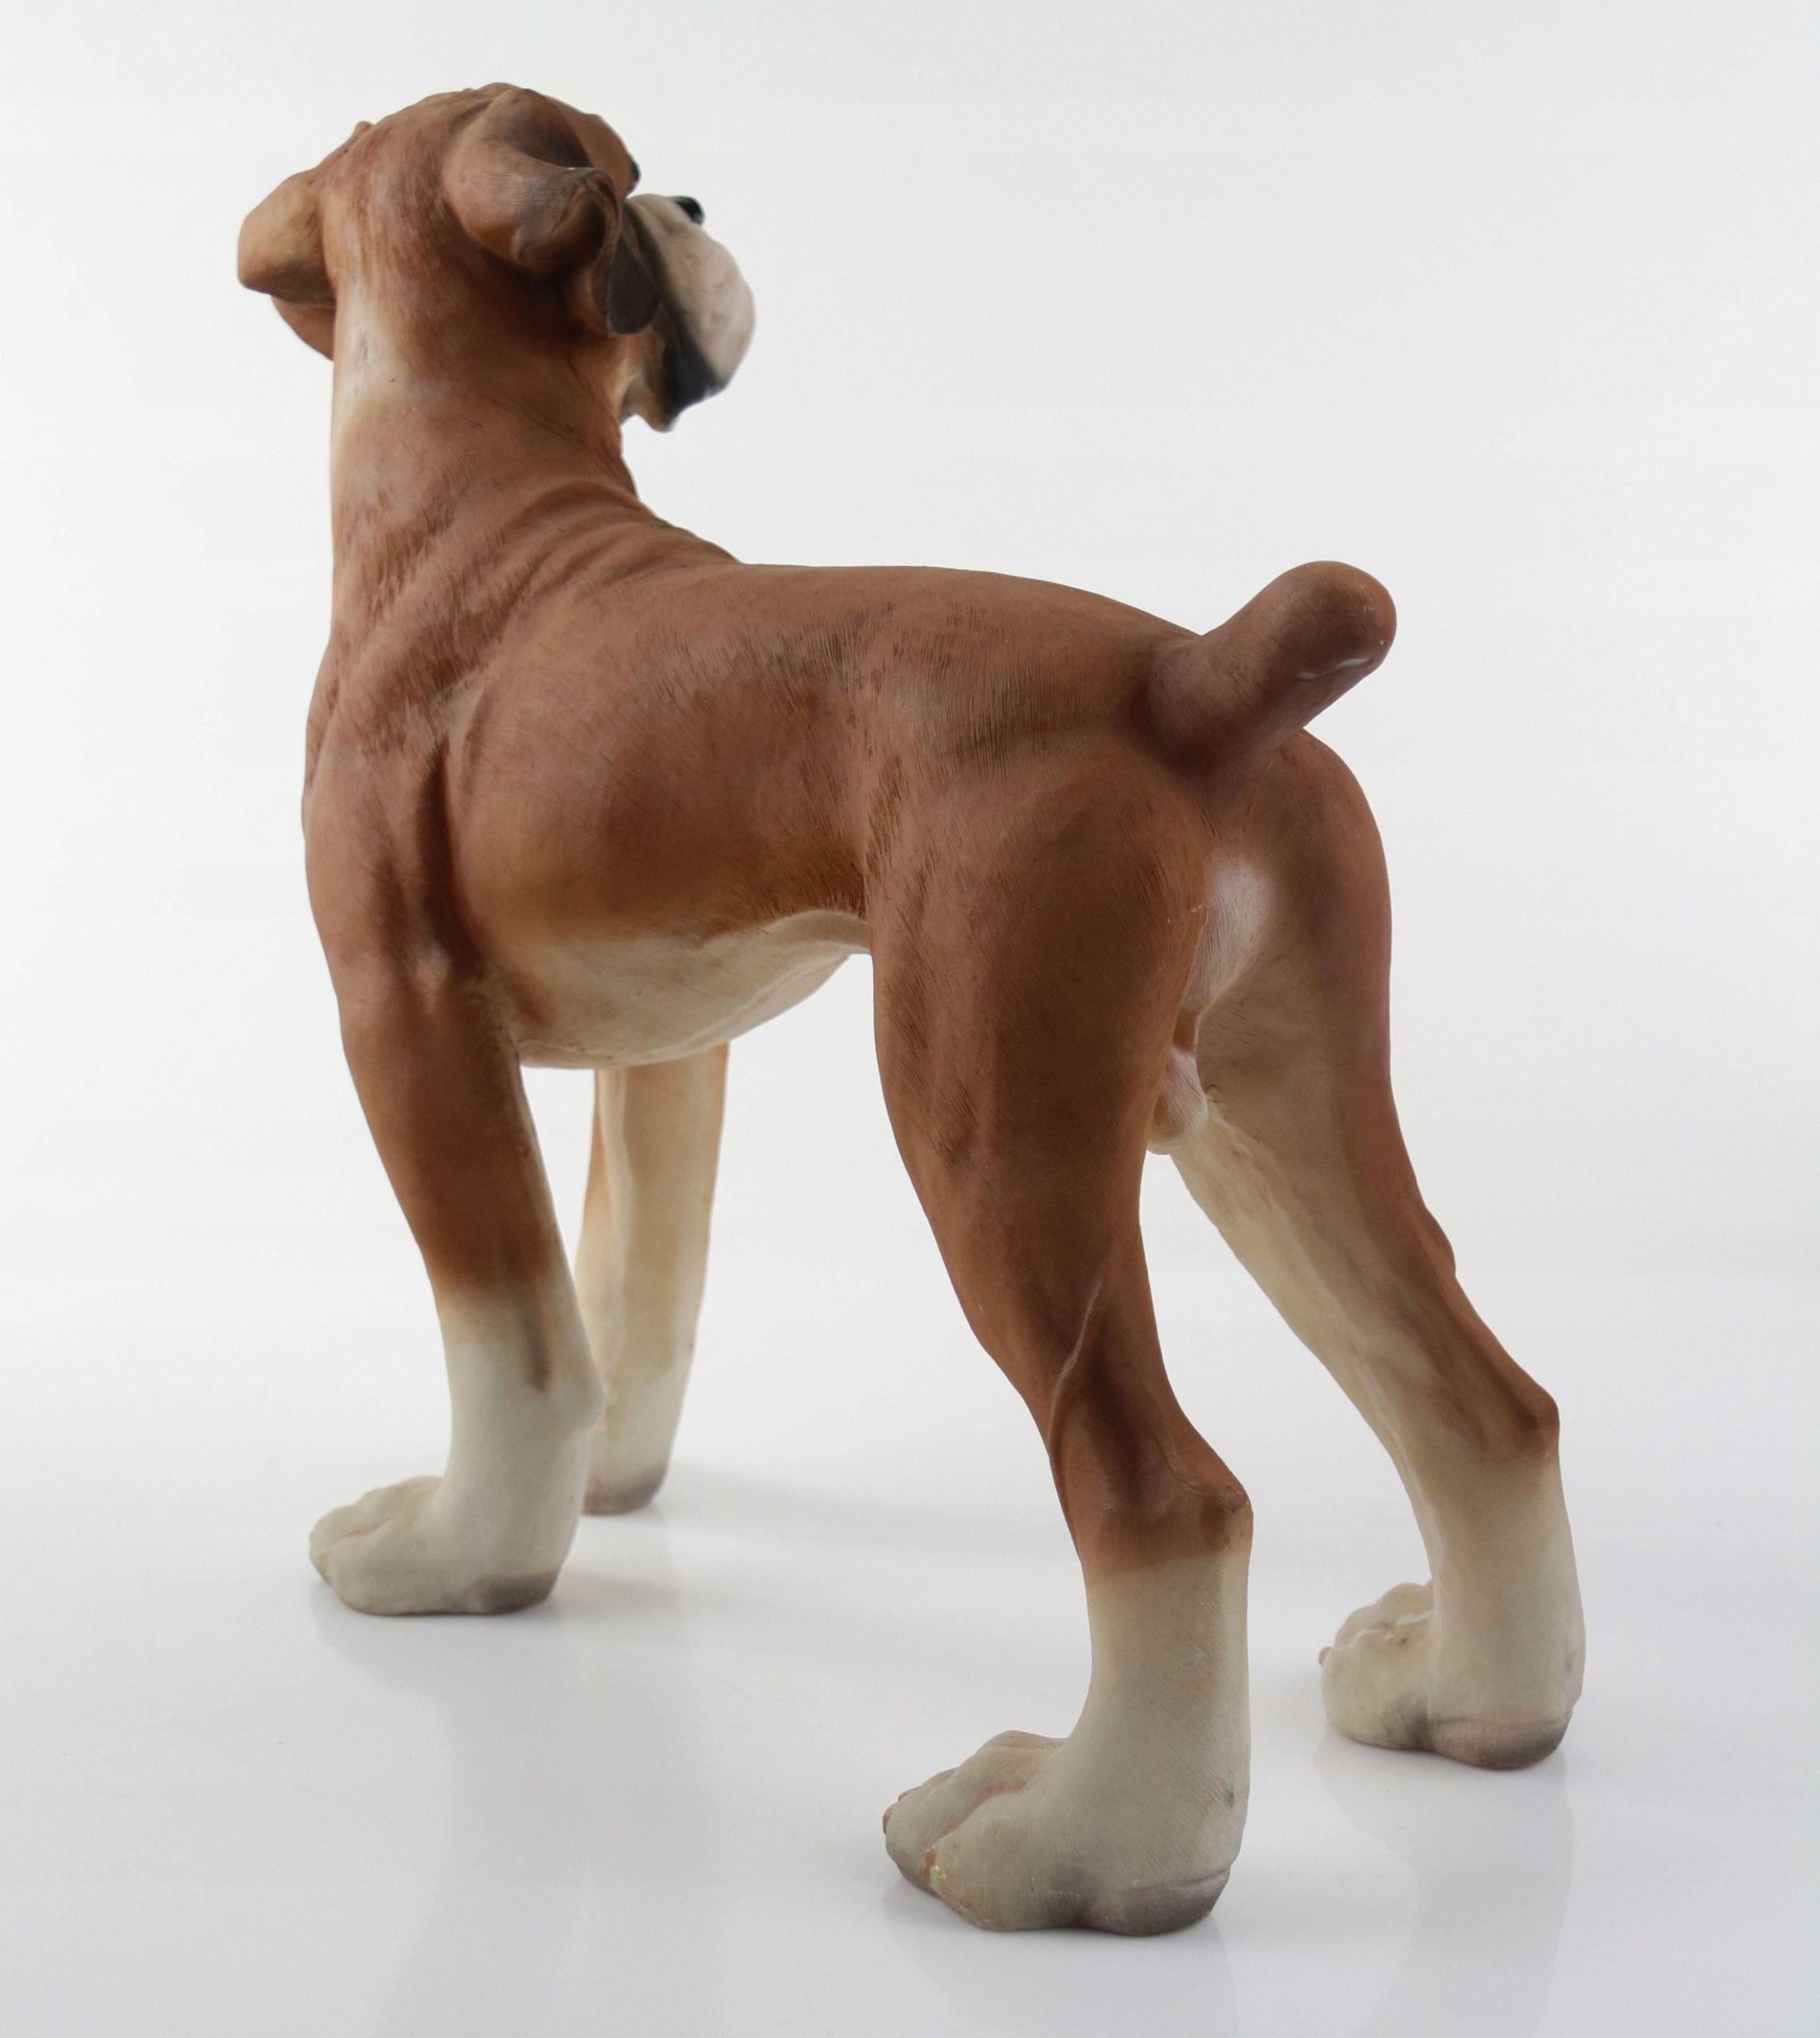 Pchli Targ Duza Figurka Pies 7873102432 Oficjalne Archiwum Allegro Allegro Dogs Animals